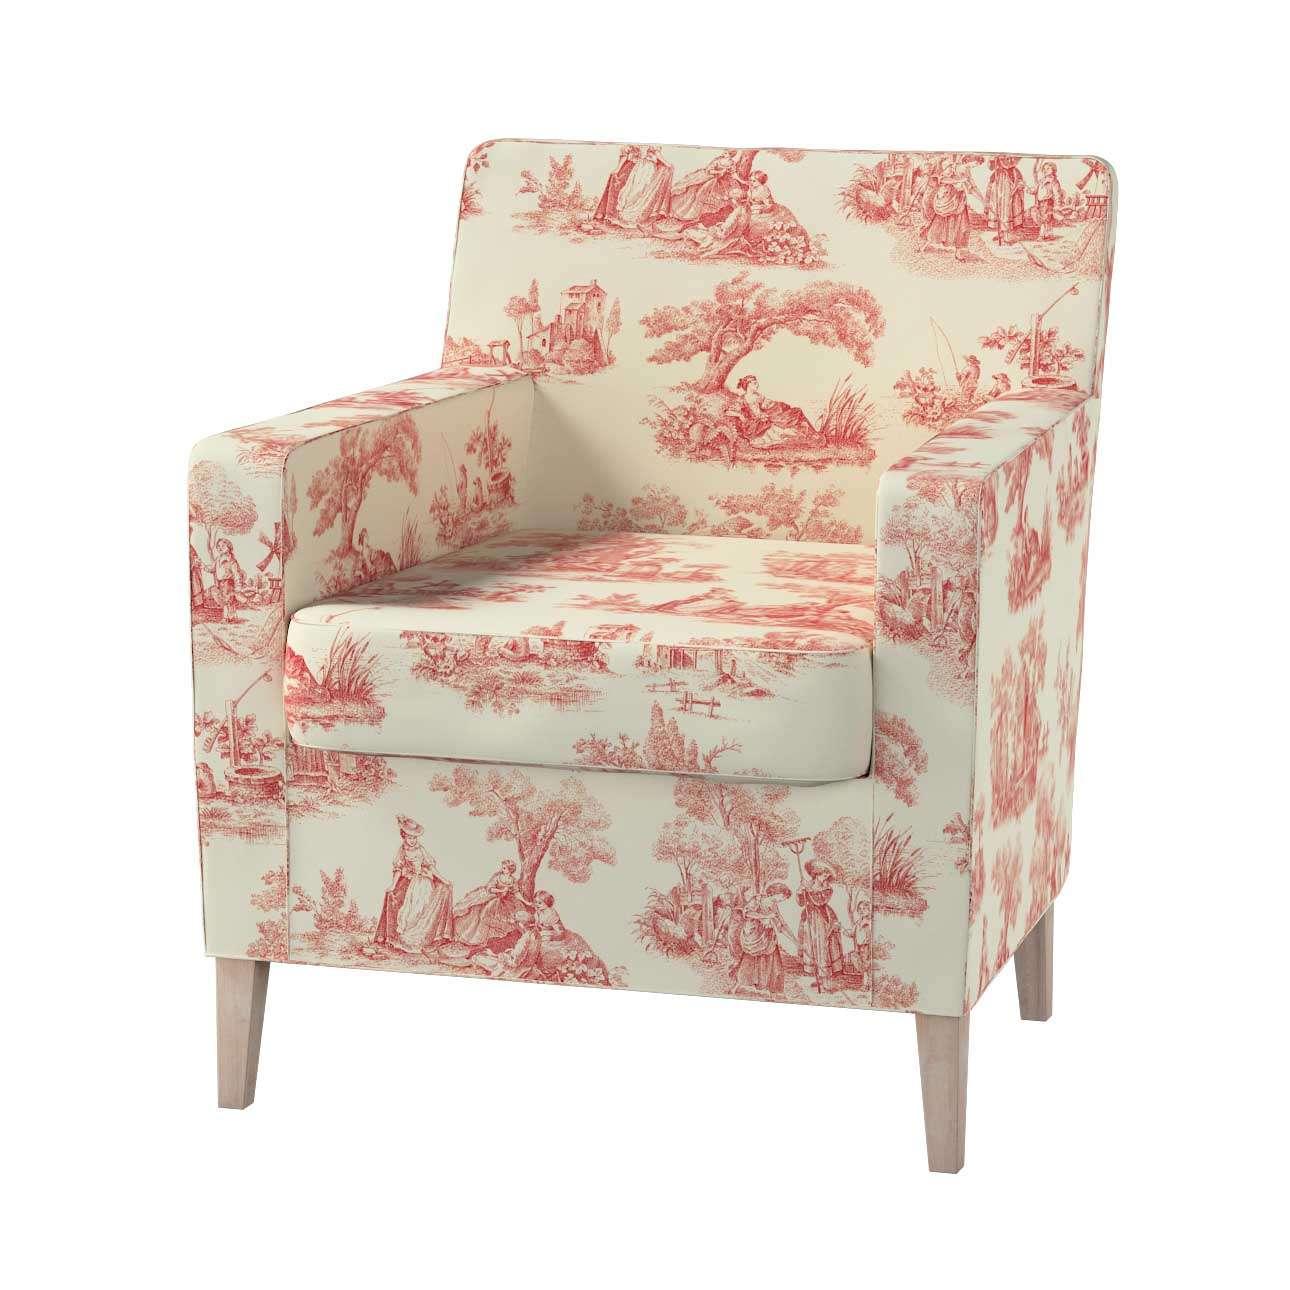 Pokrowiec na fotel Karlstad Fotel  Karlstad w kolekcji Avinon, tkanina: 132-15